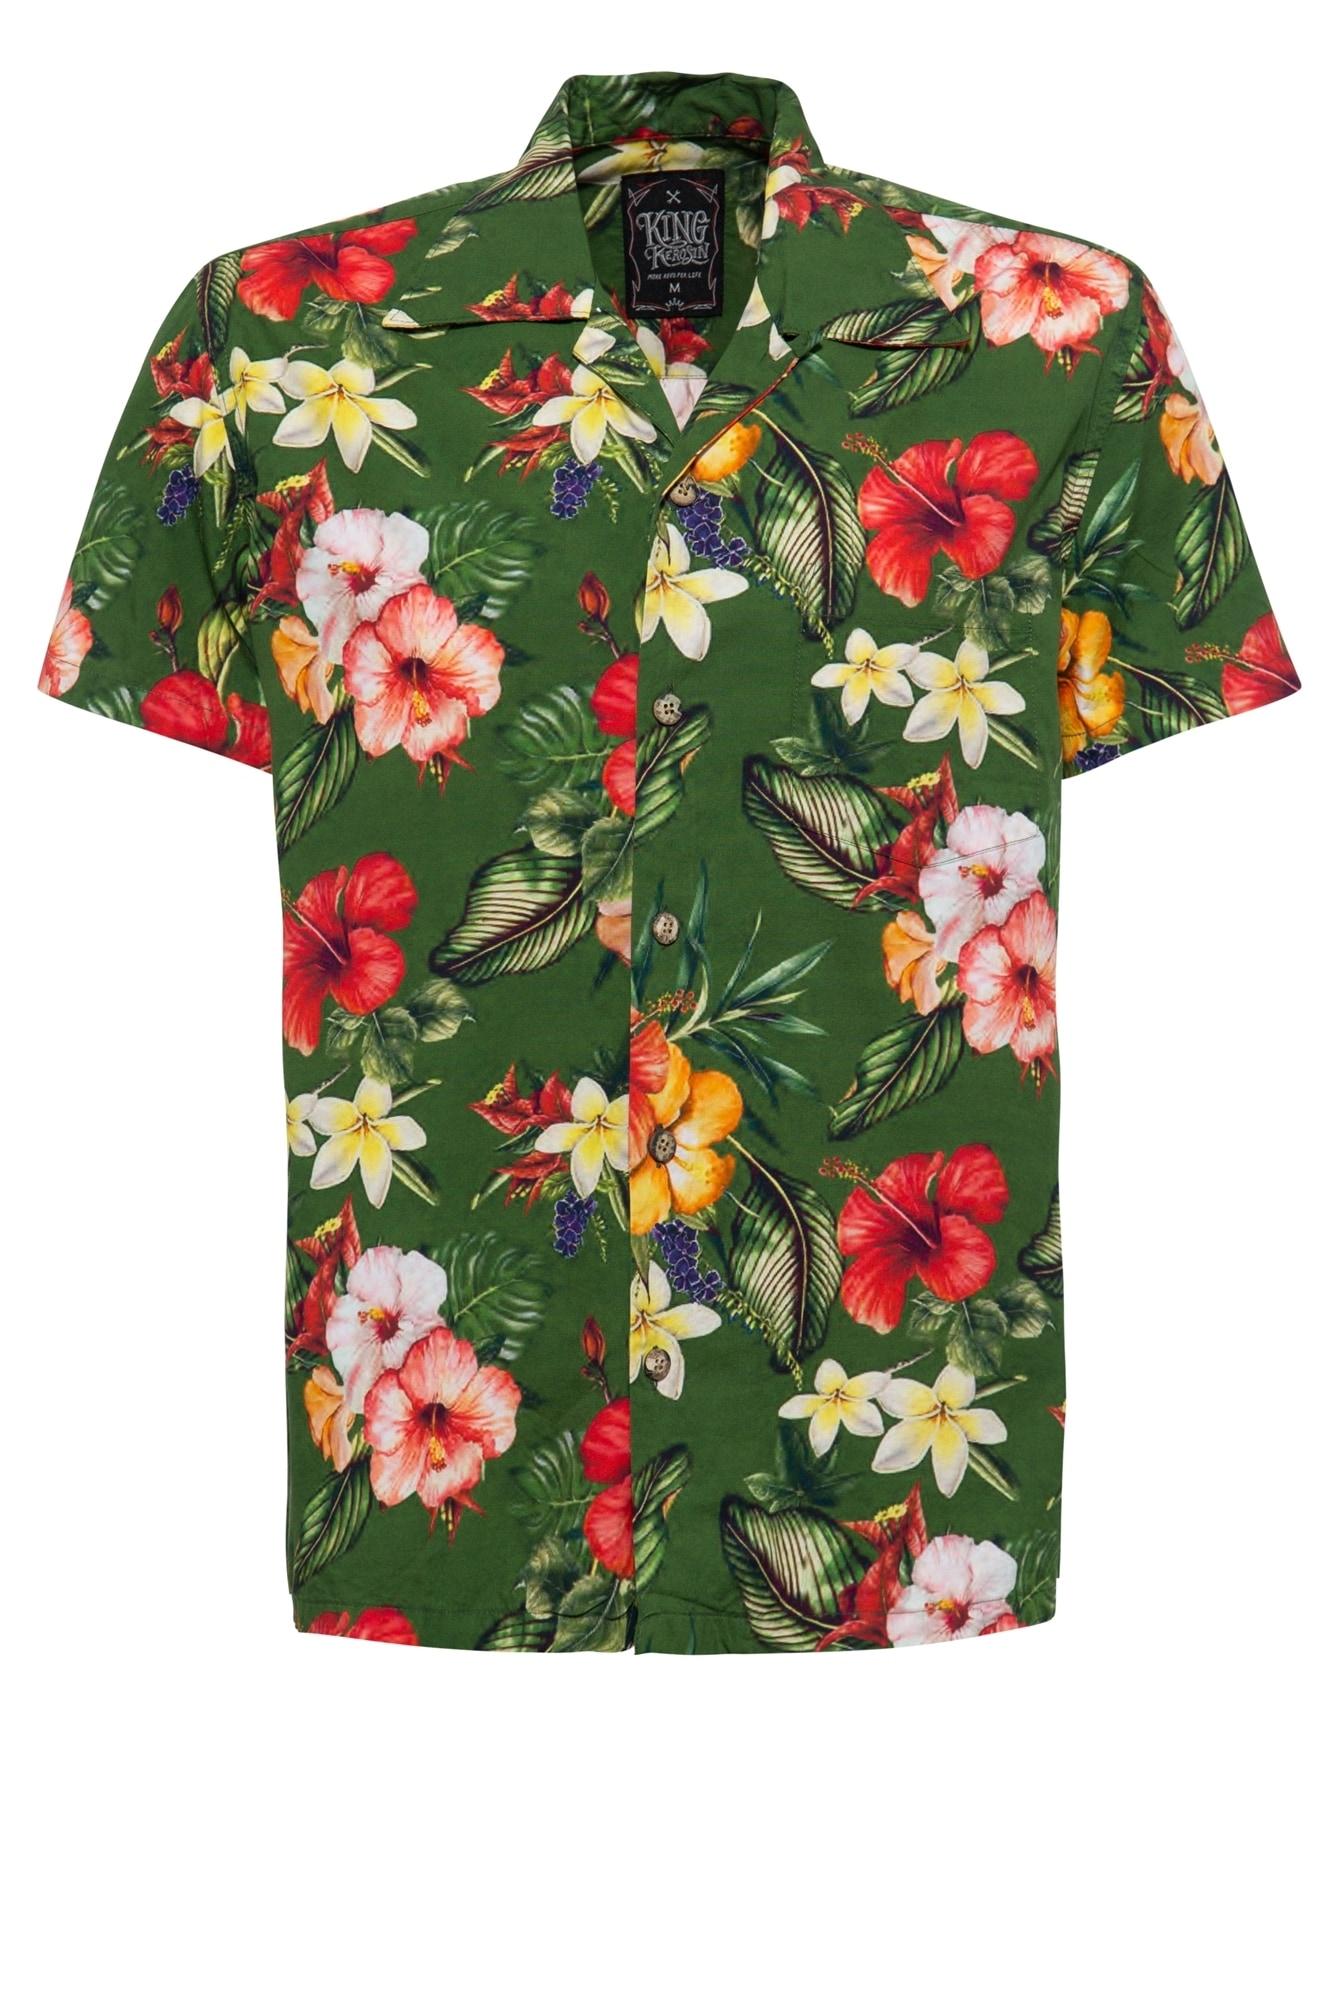 KingKerosin Hawaiihemd Tropic   Bekleidung > Hemden > Hawaiihemden   Kingkerosin